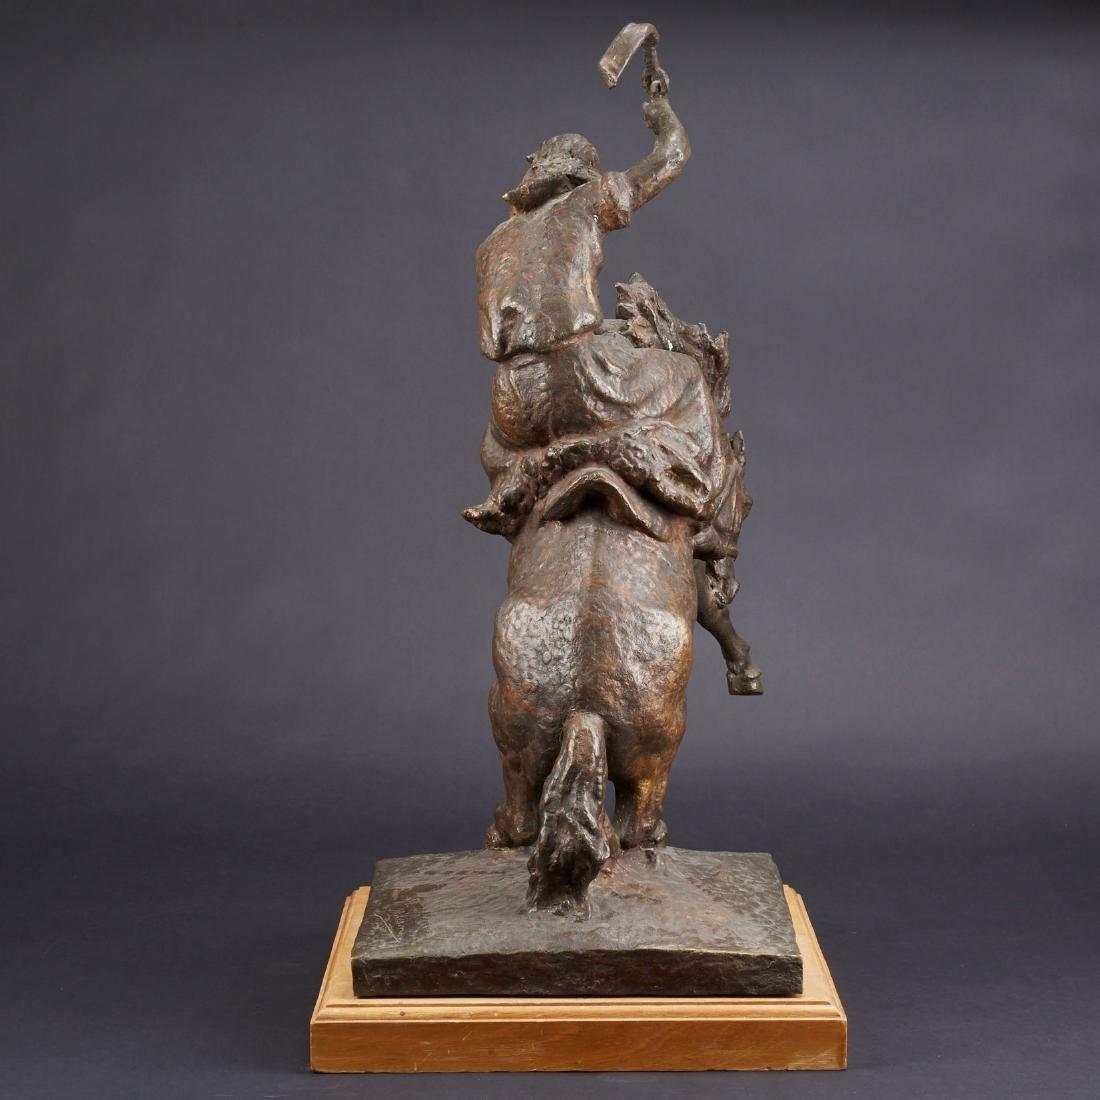 Jose Belloni Jineteando Bronze Sculpture - 3